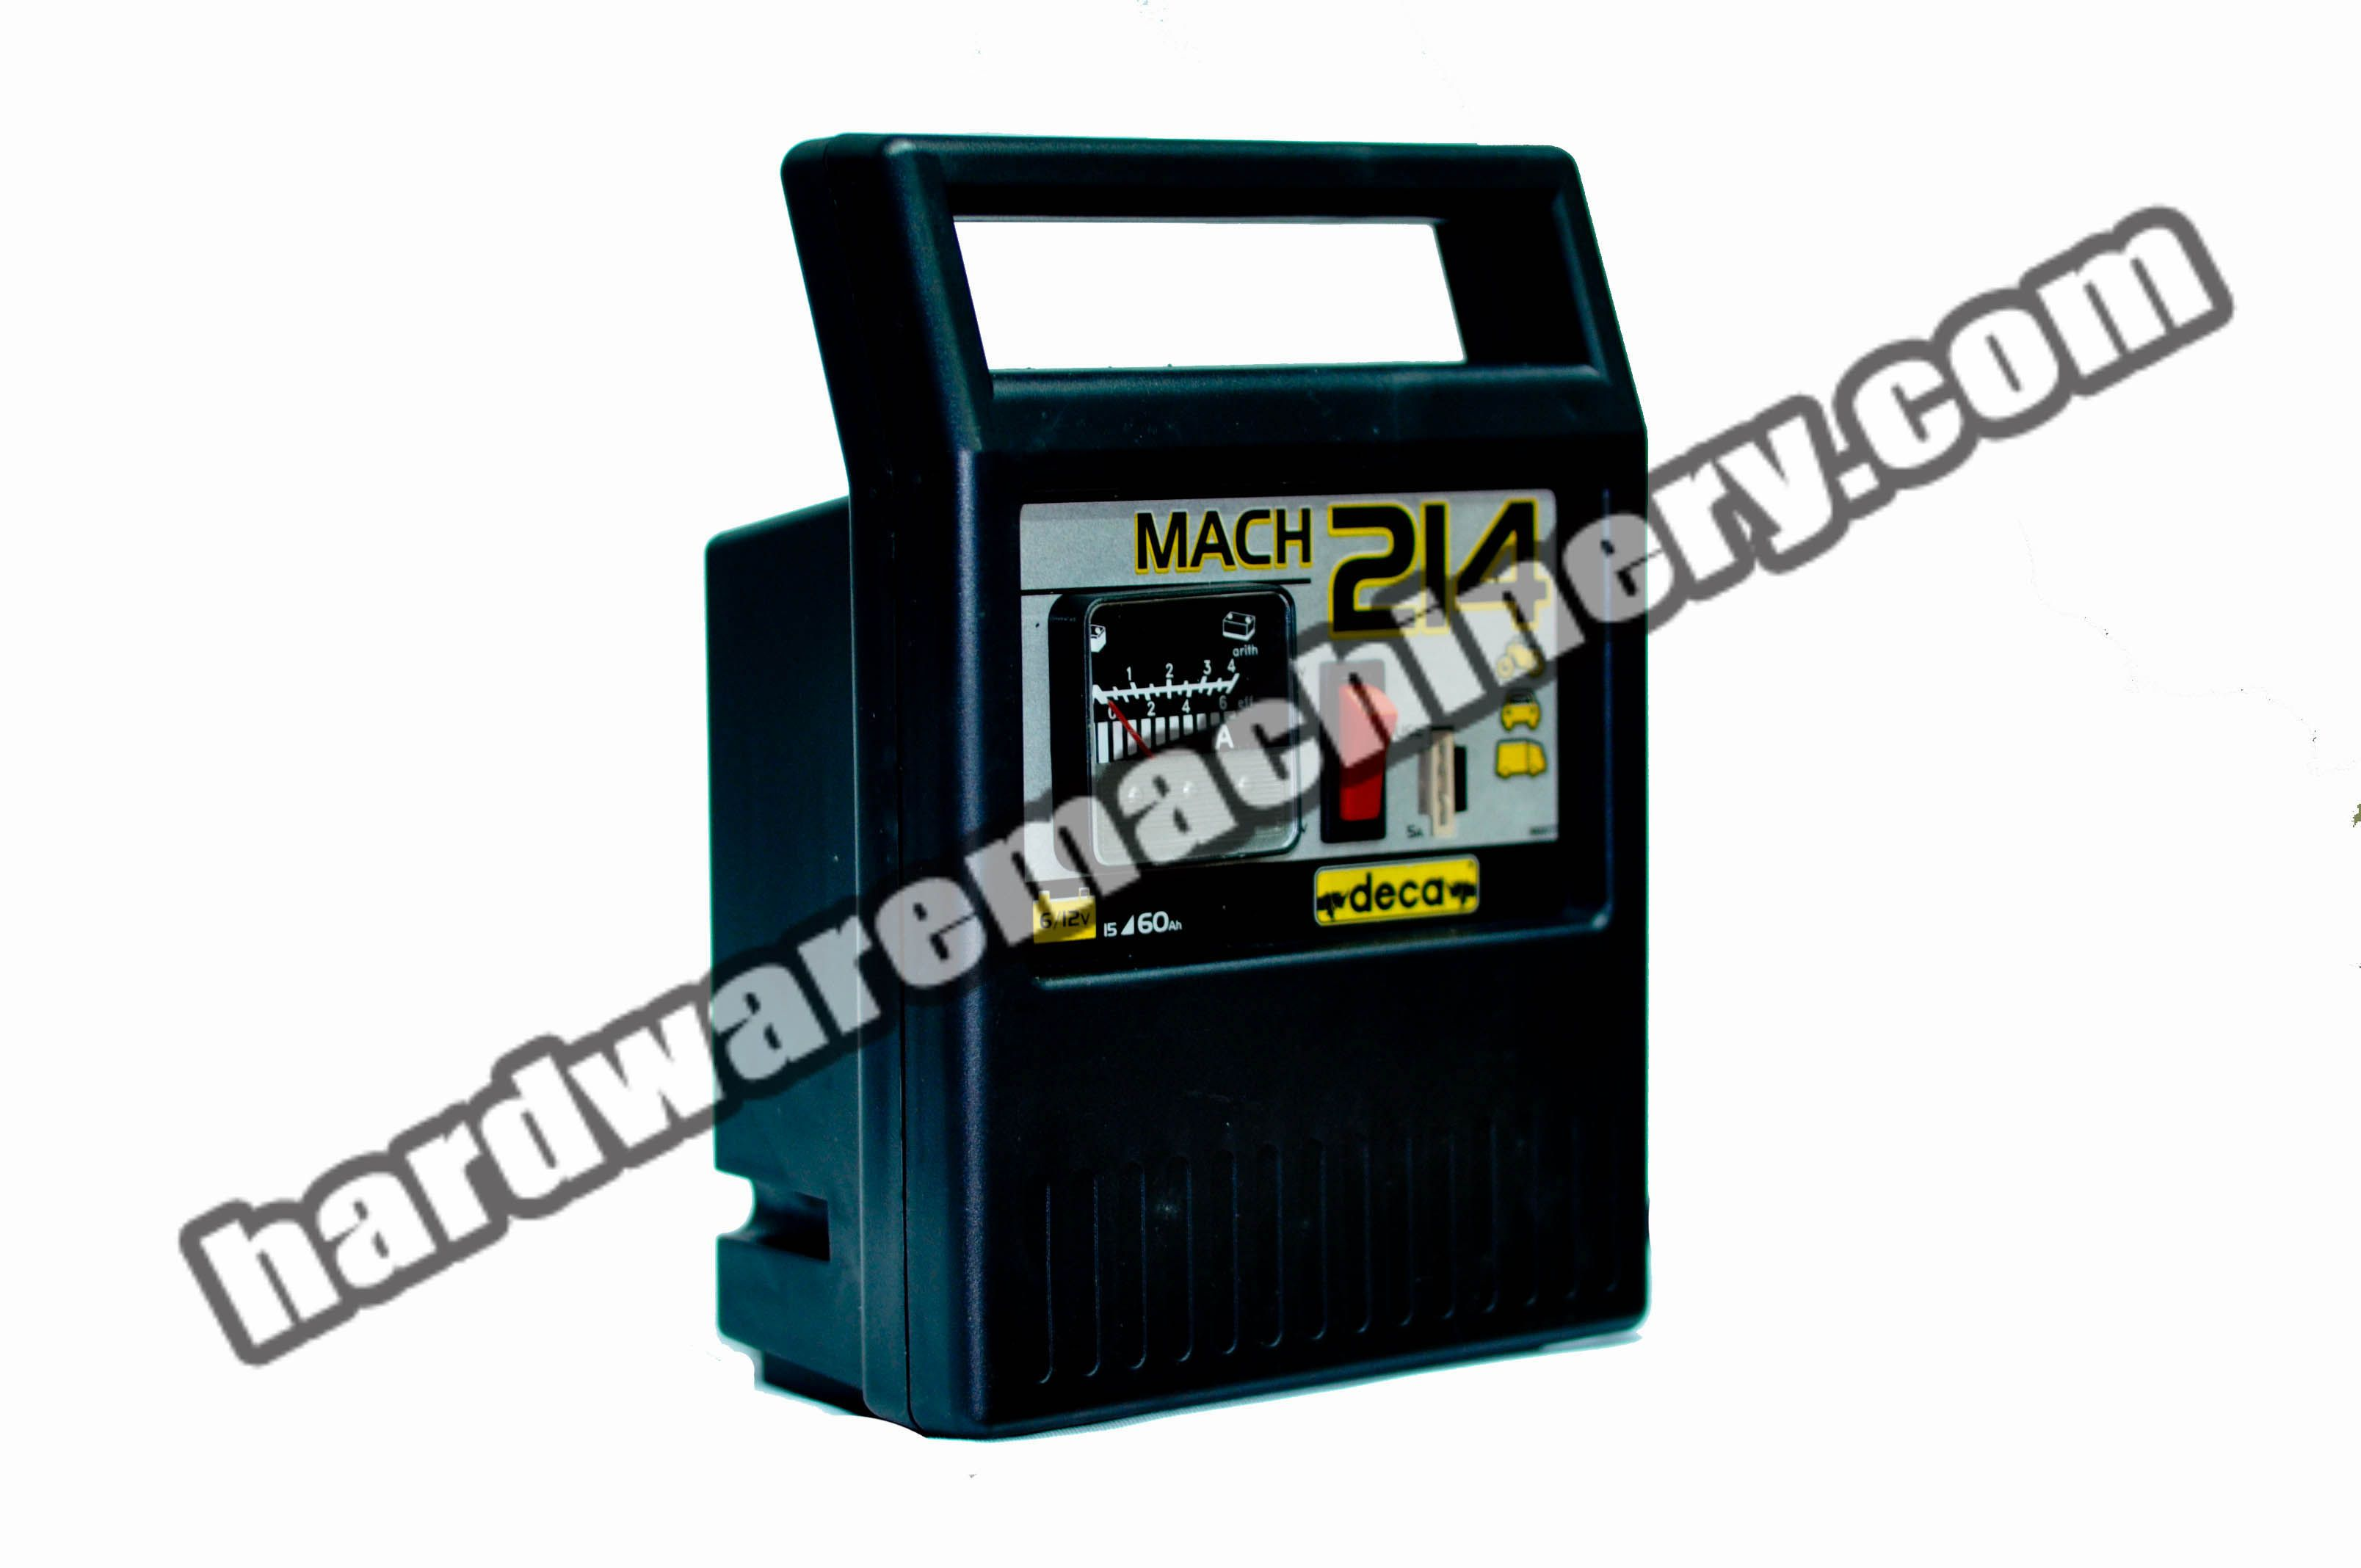 Deca Mach 214 Battery Charger for 6V, 12V battery